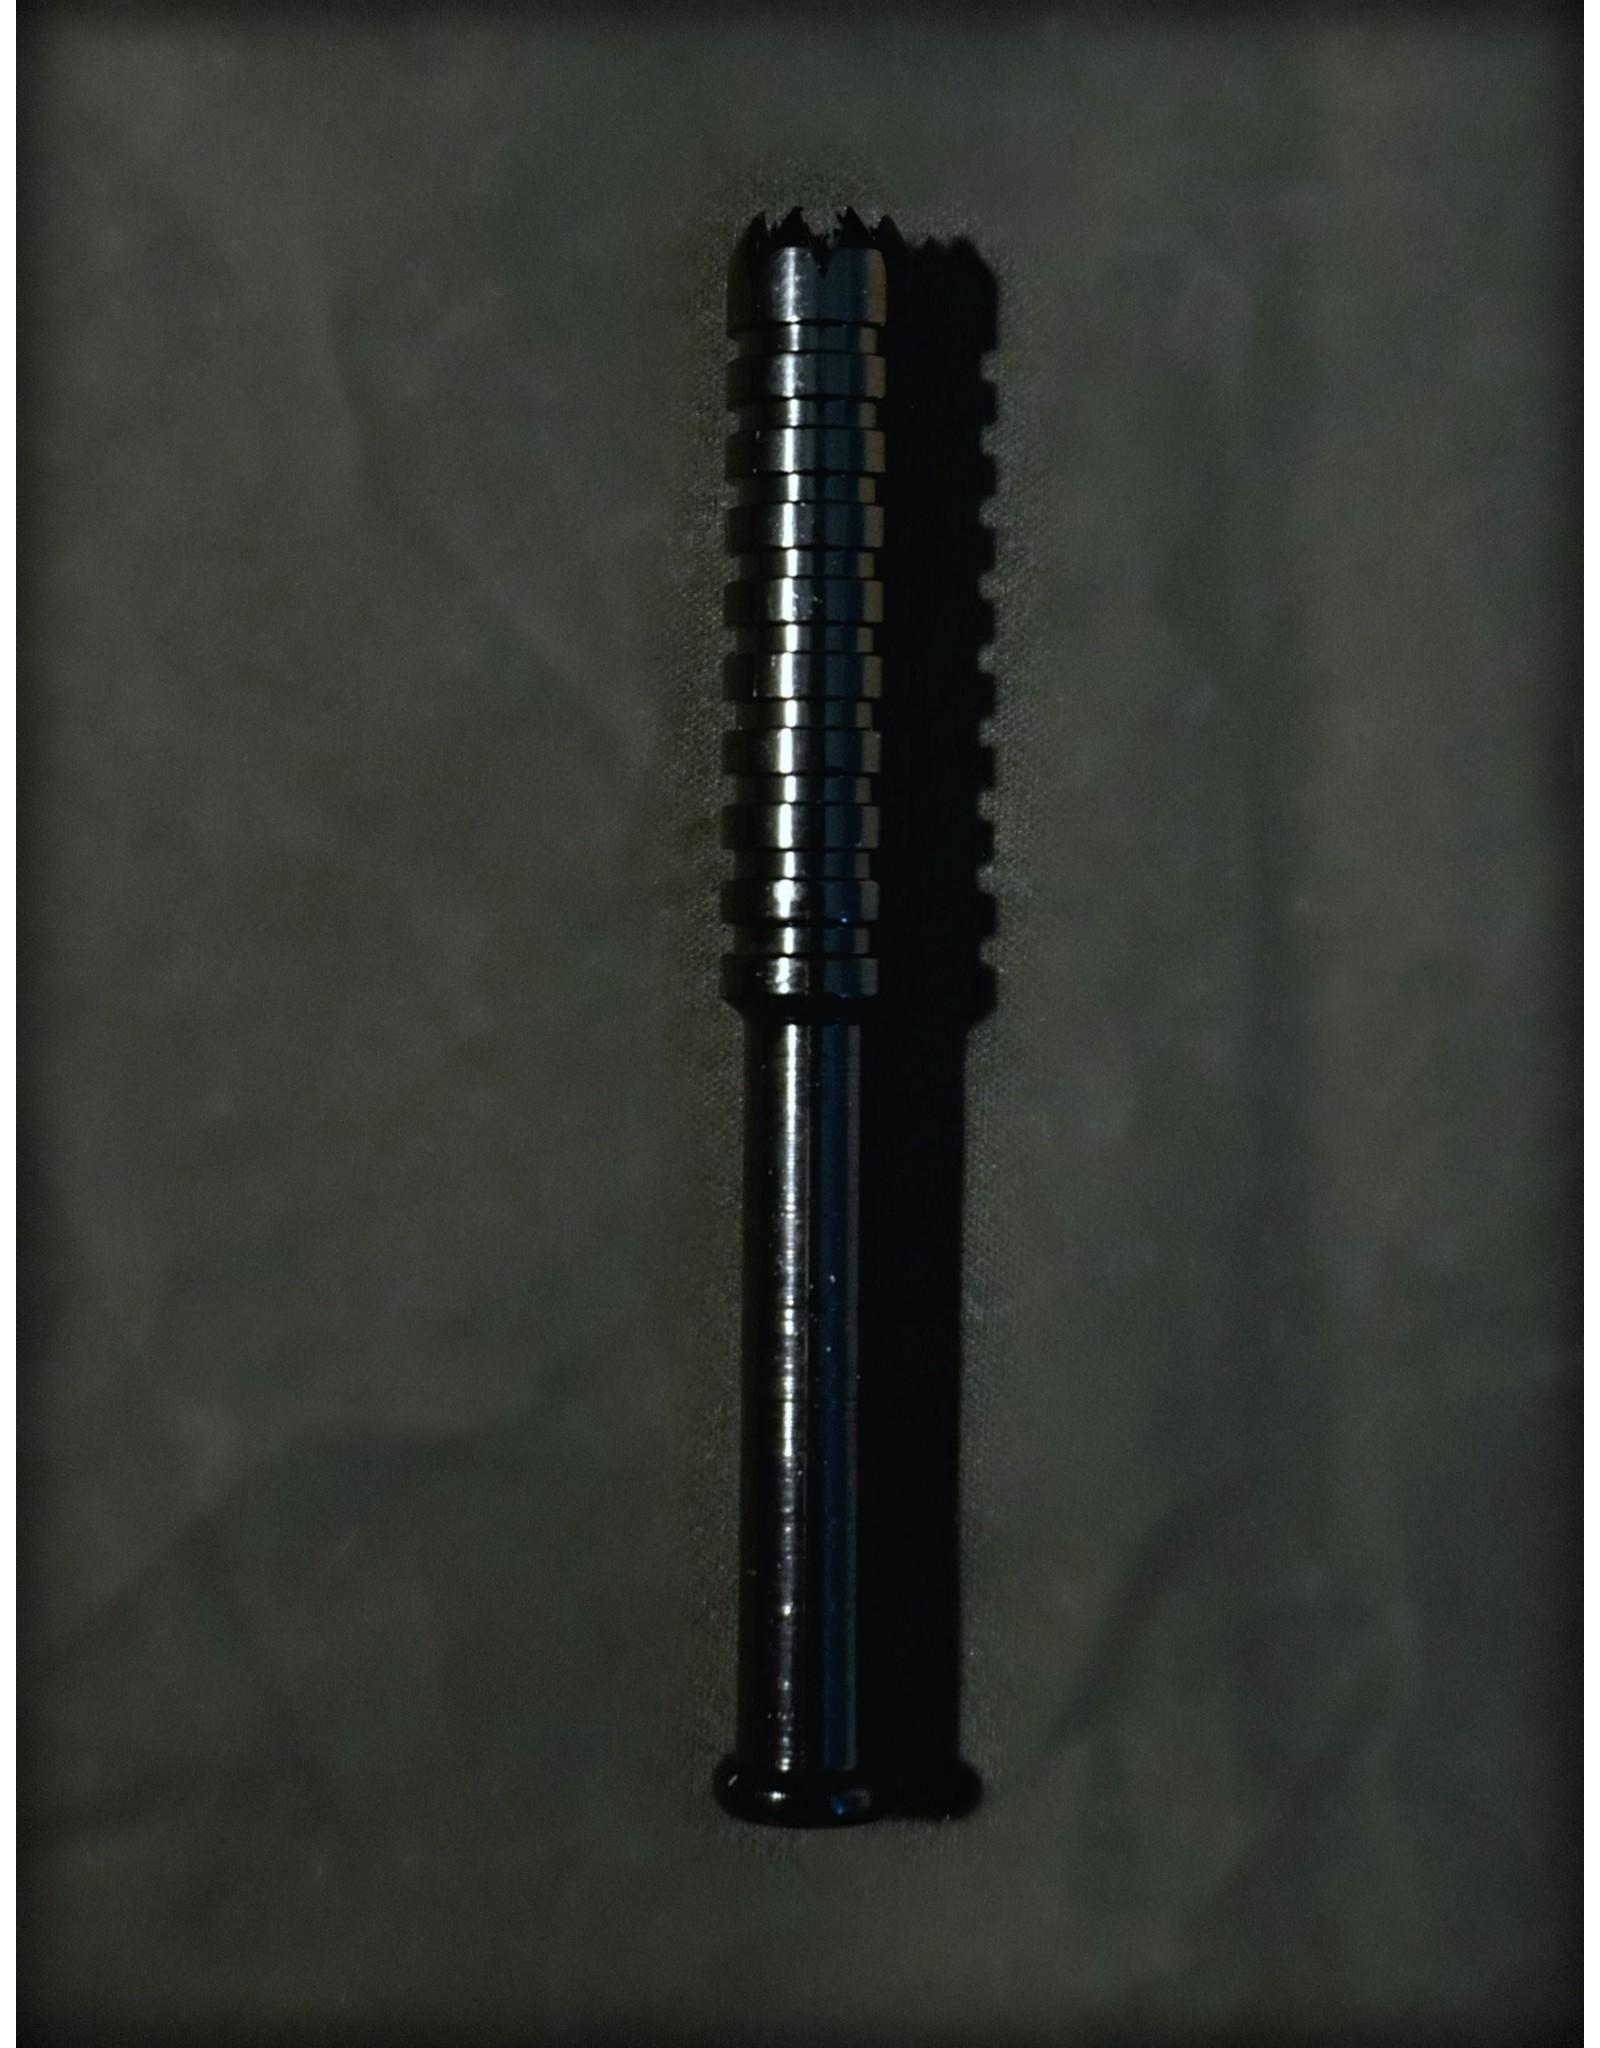 Large Anodized Digger Taster - Black